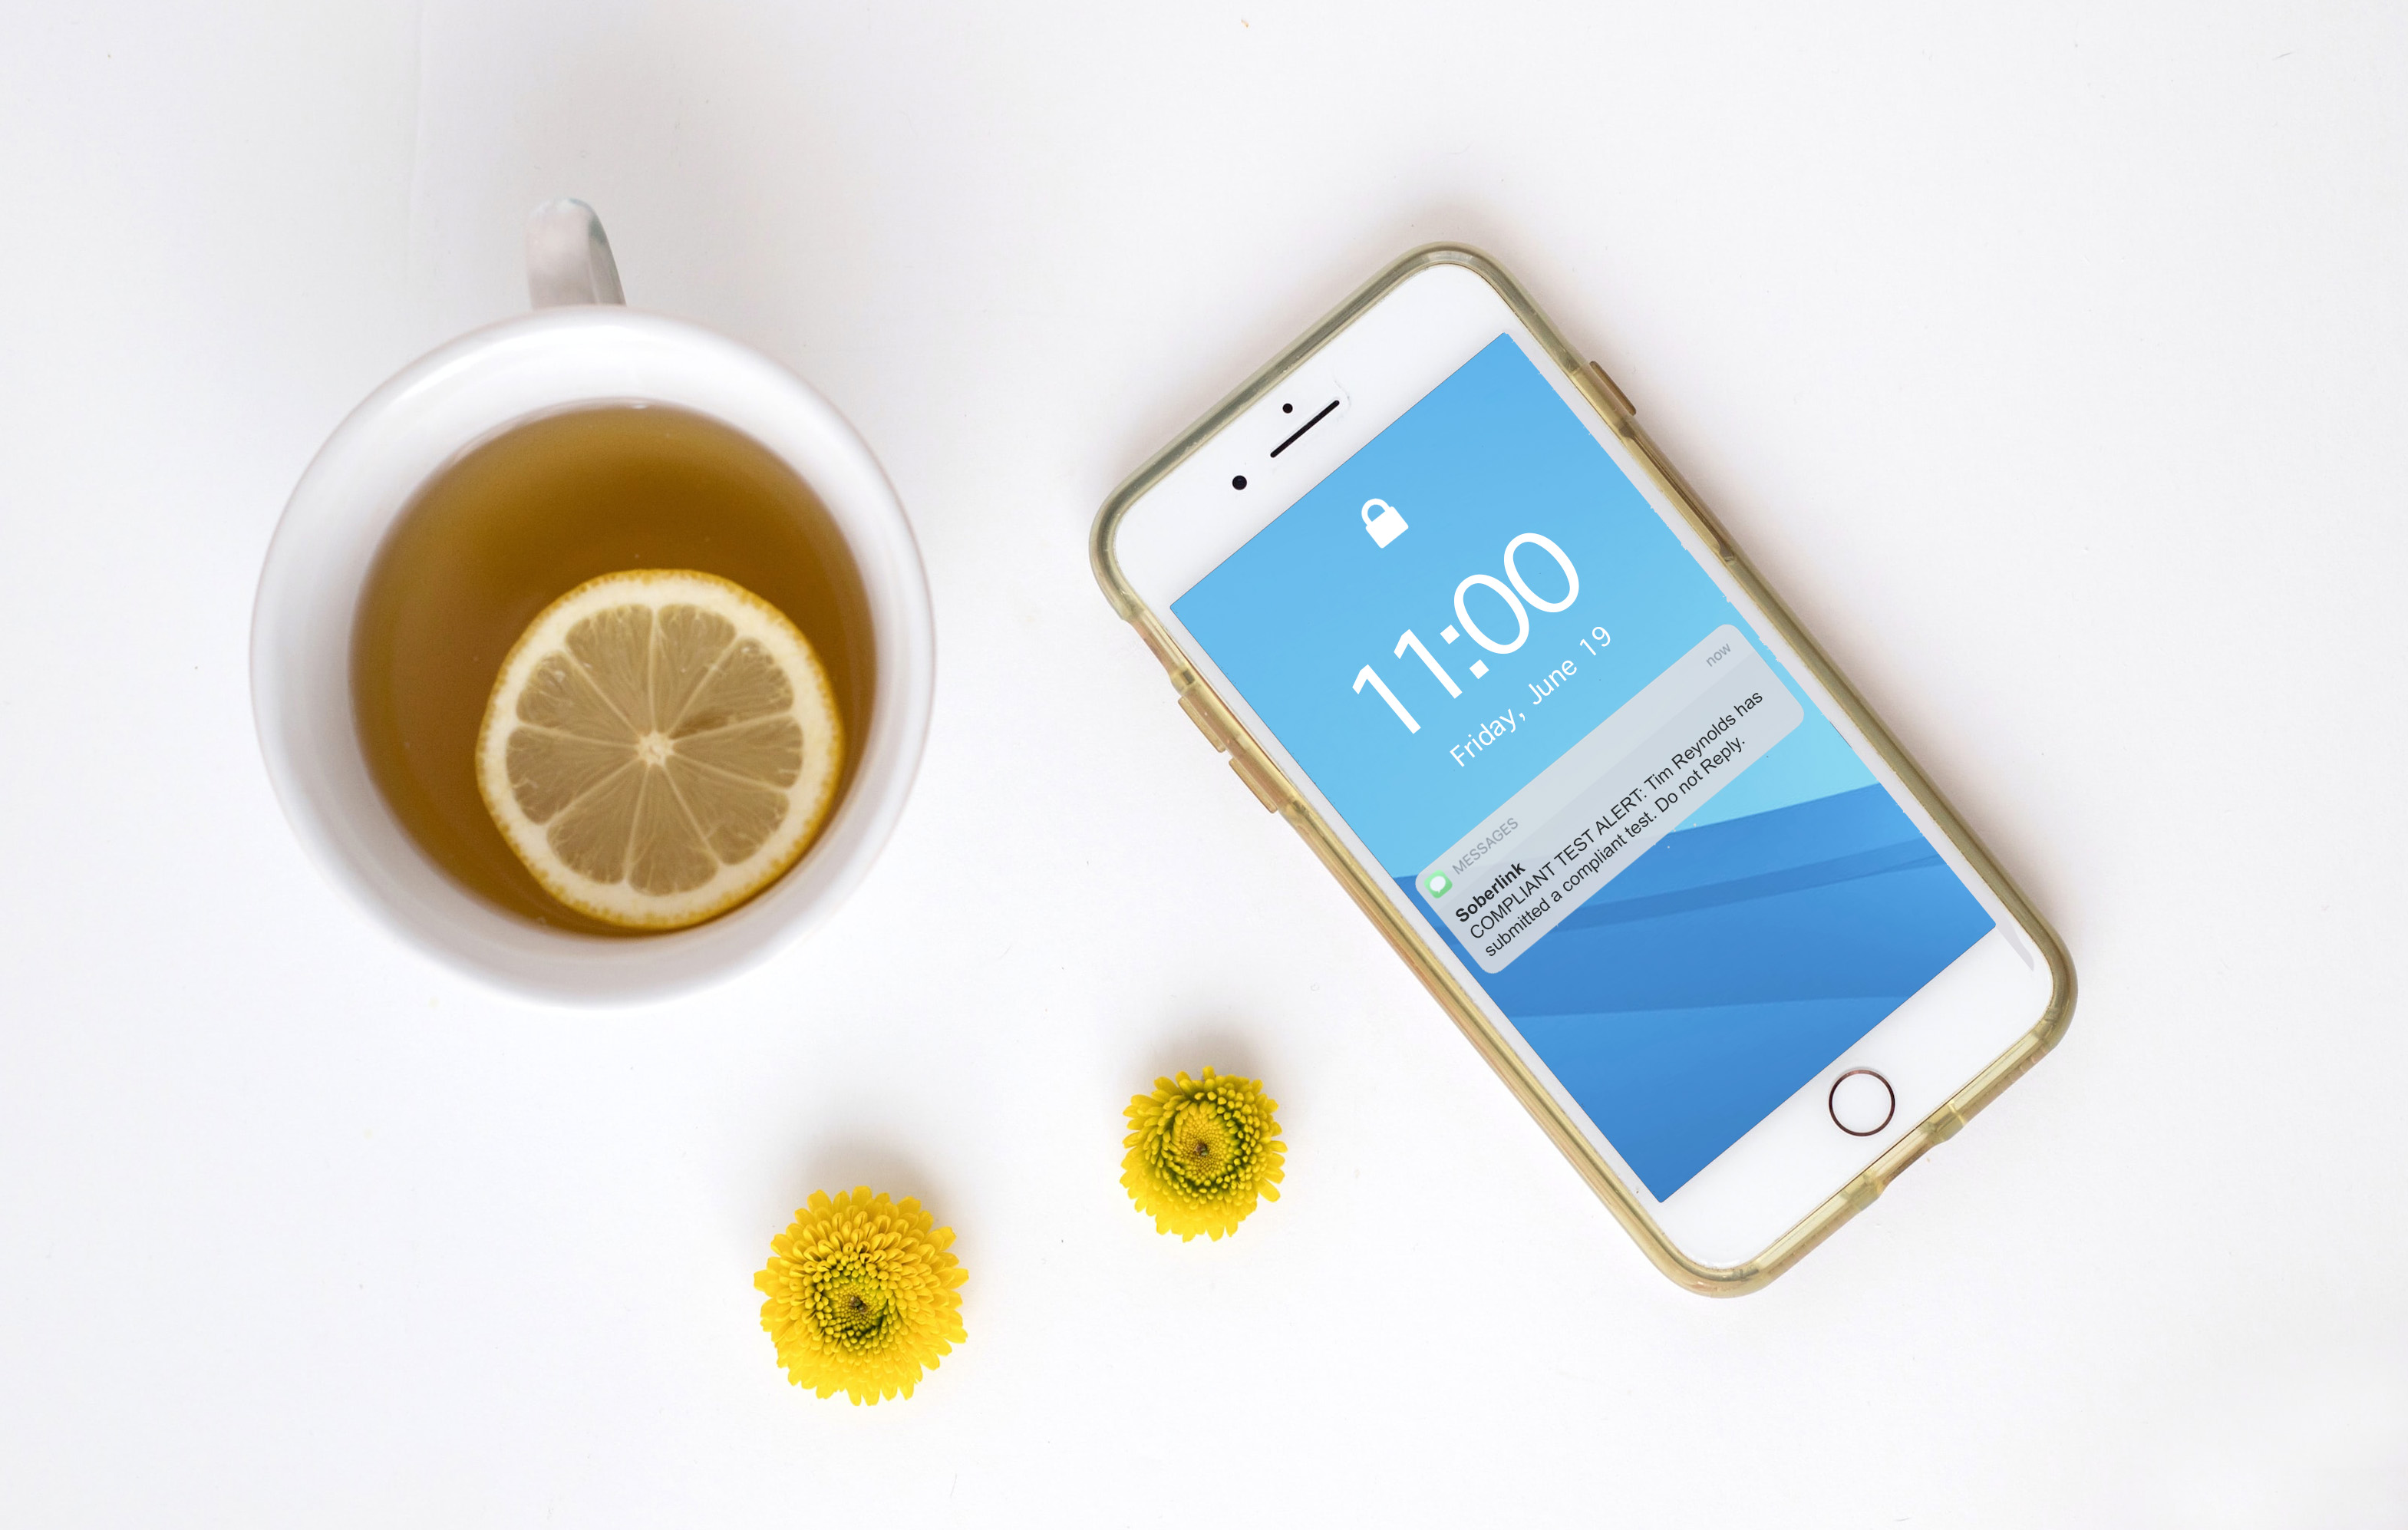 iPhone detailing Soberlink Compliant Test Alert